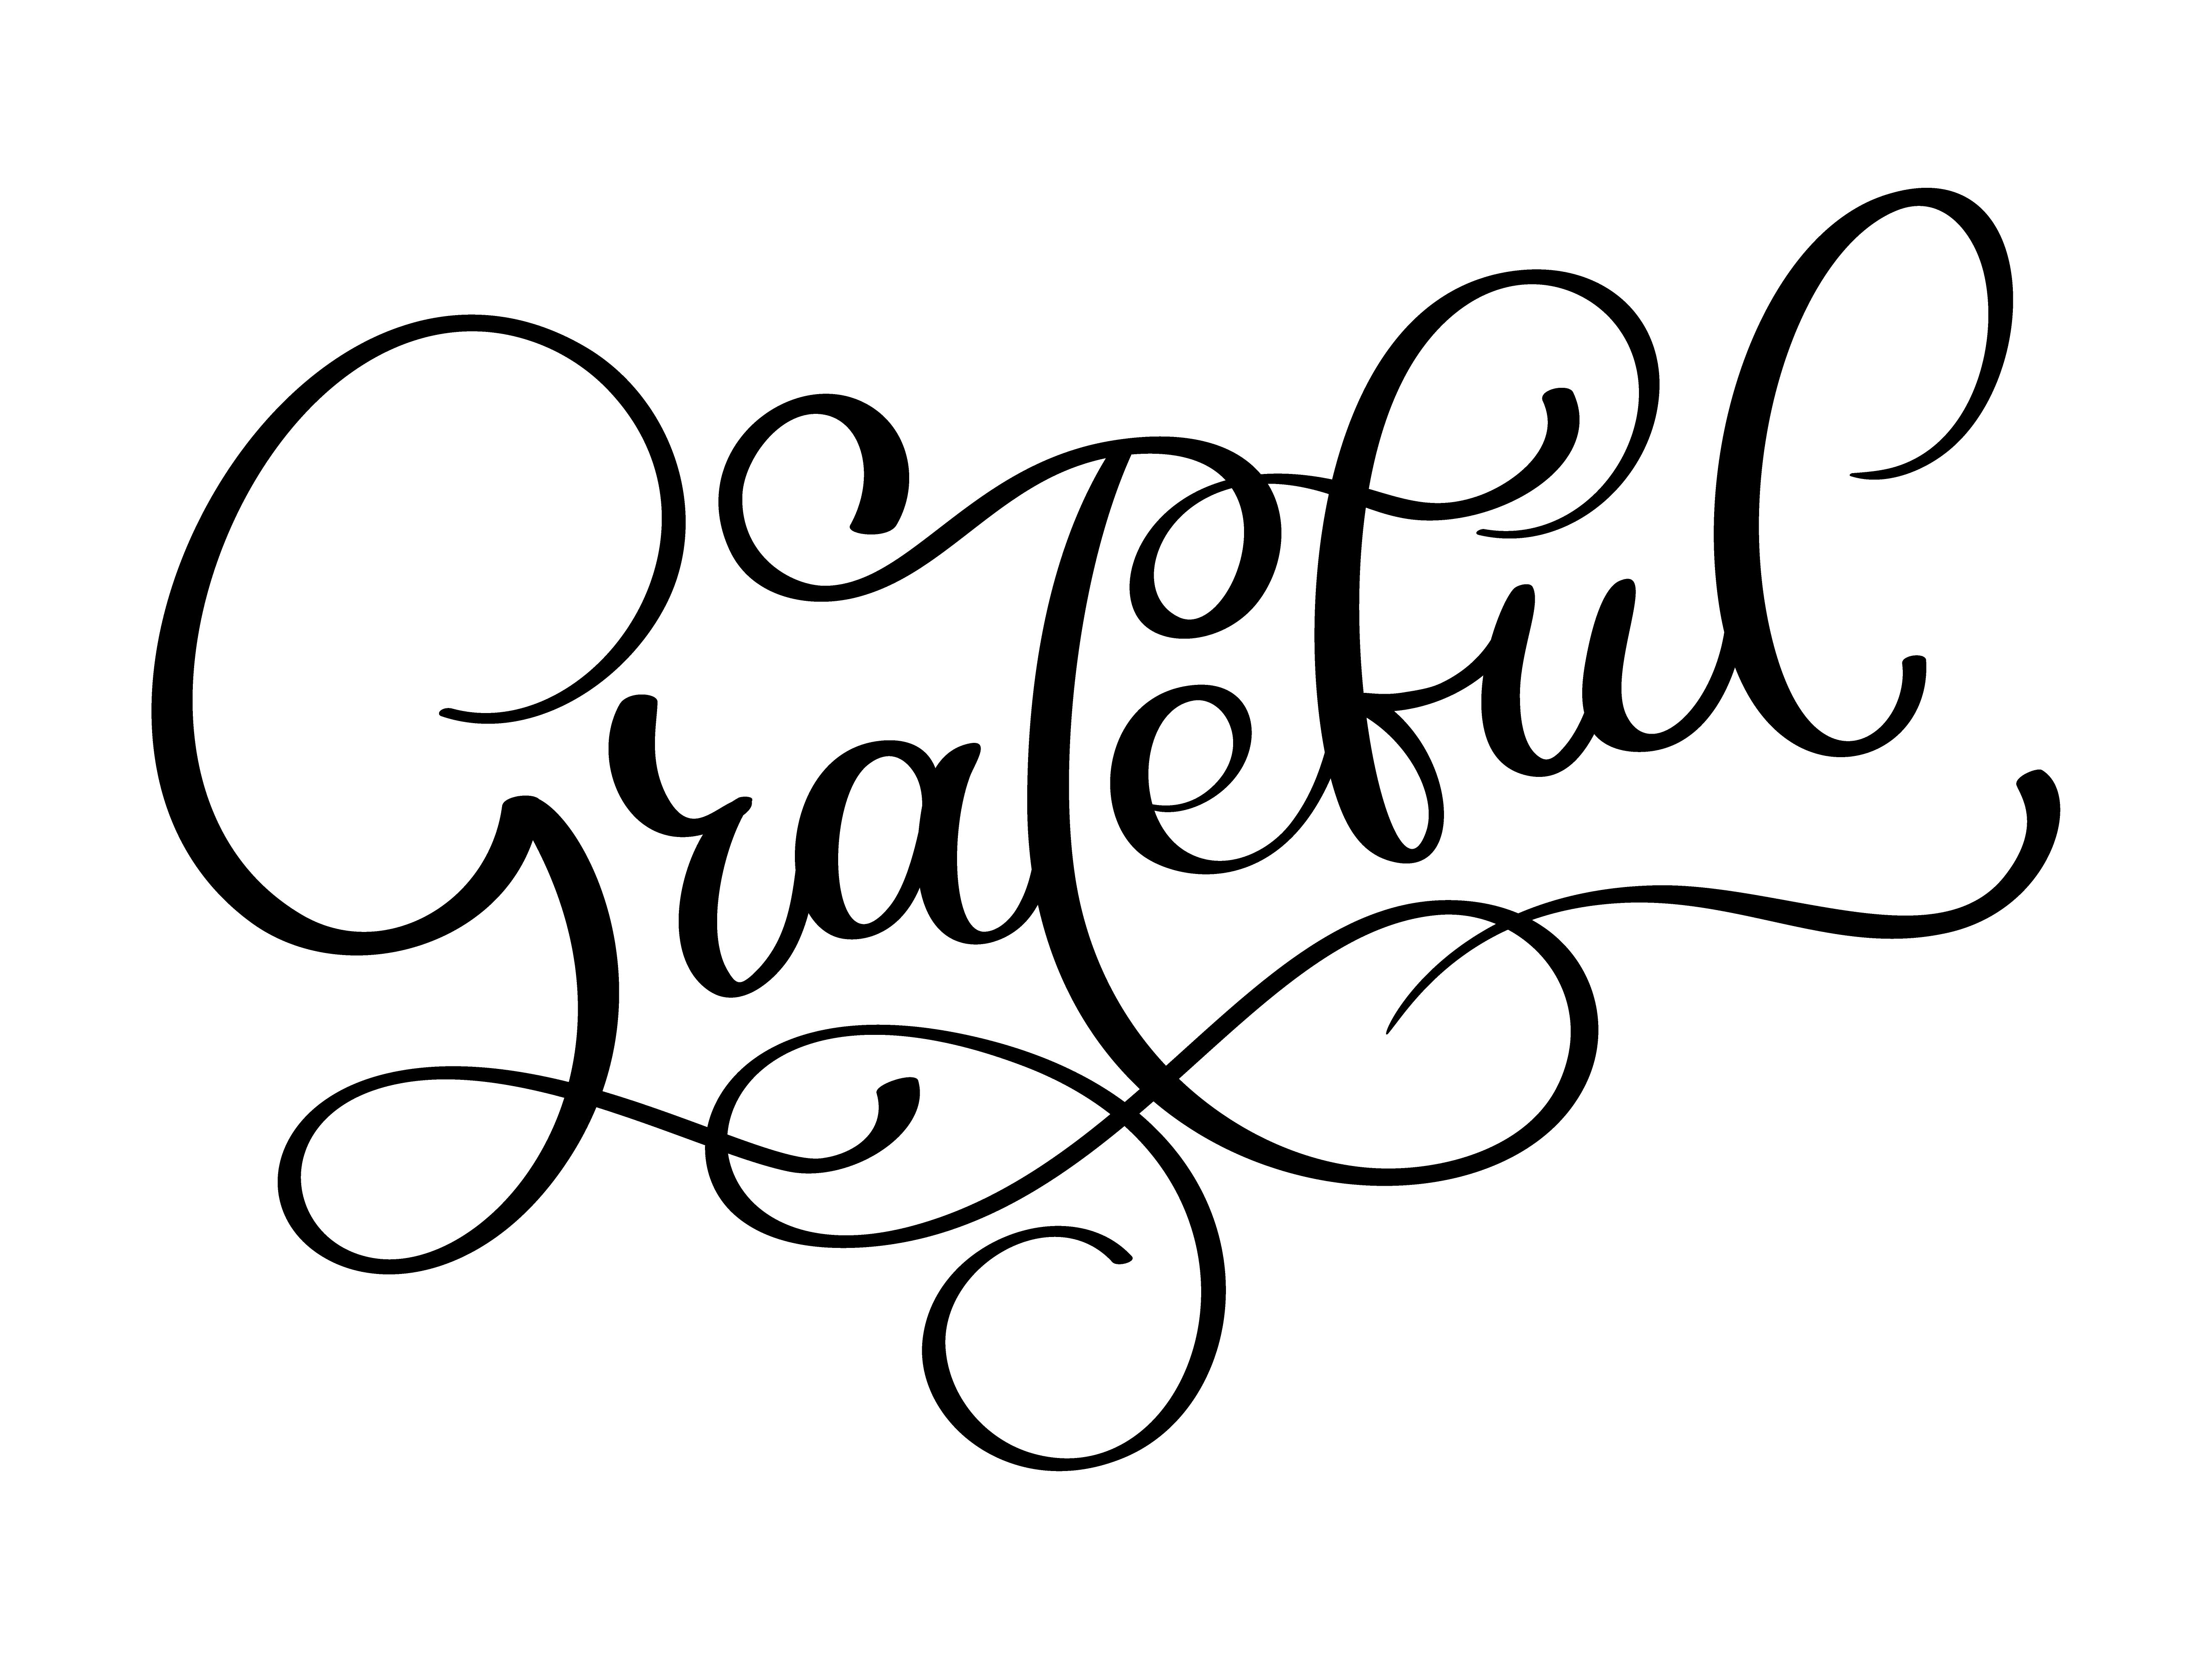 Grateful Hand Drawn Postcard Vector Lettering For